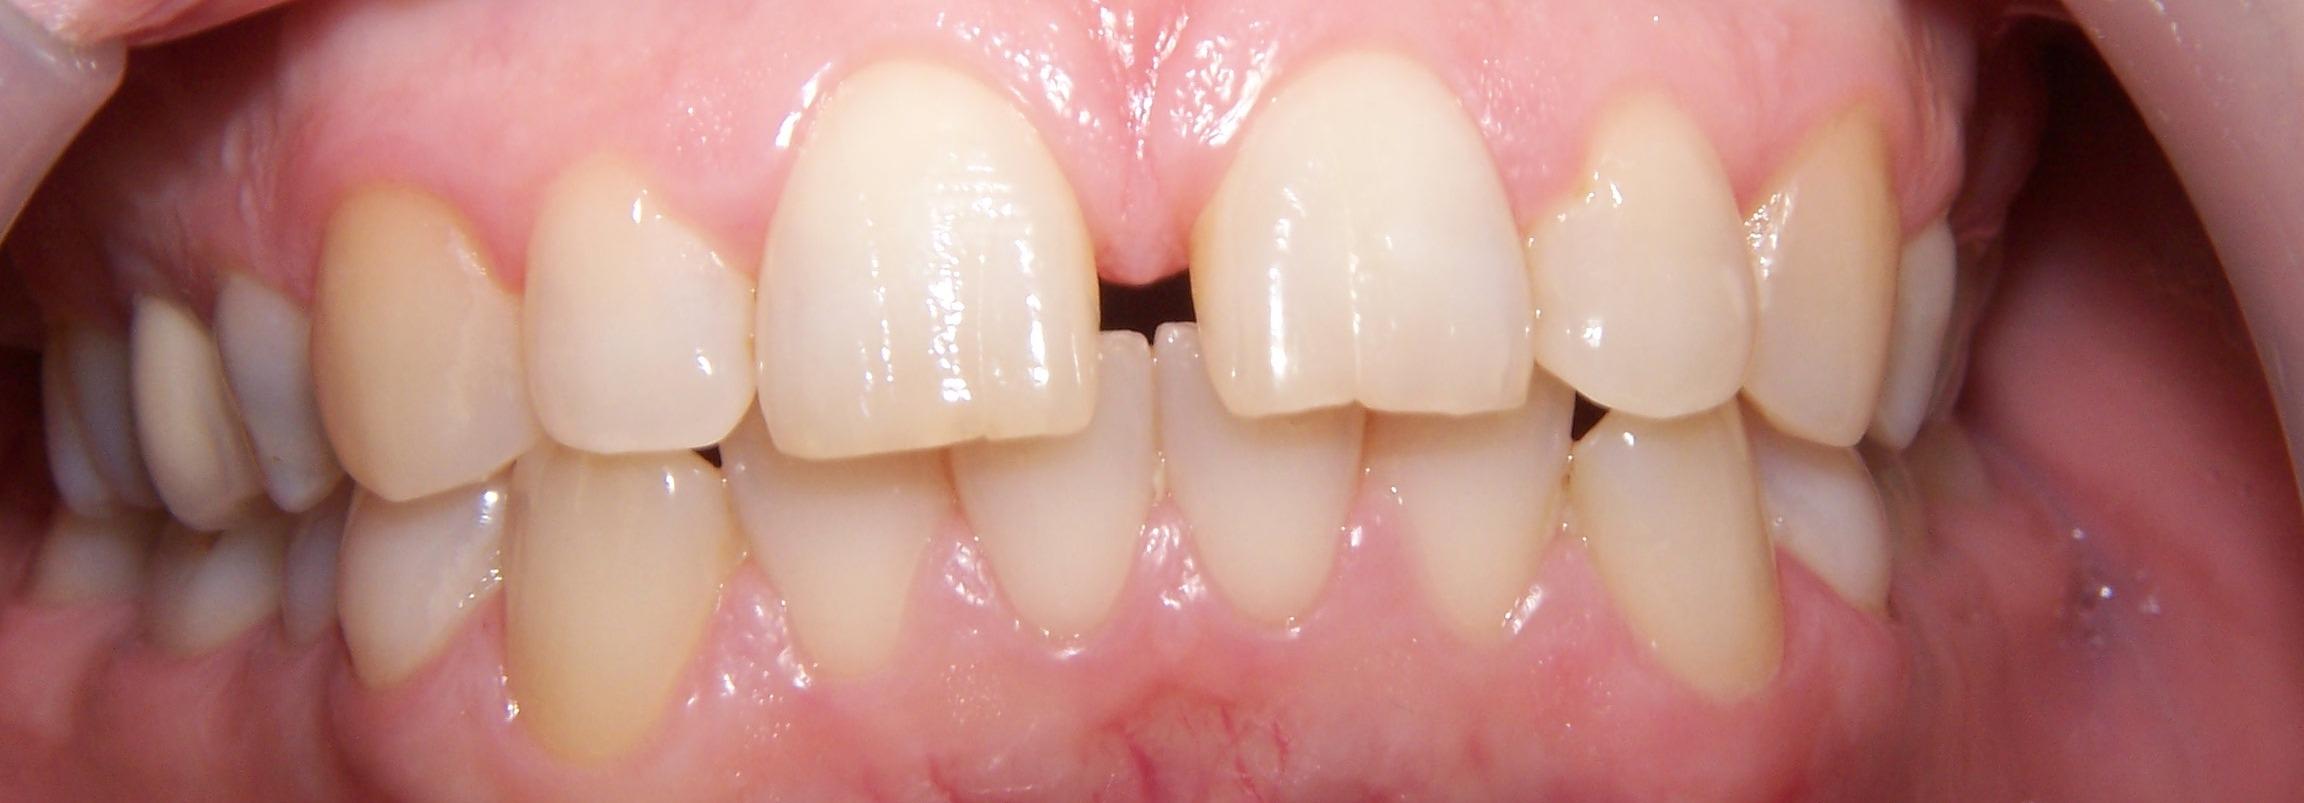 Dental Case Studies Plymouth Smile Care